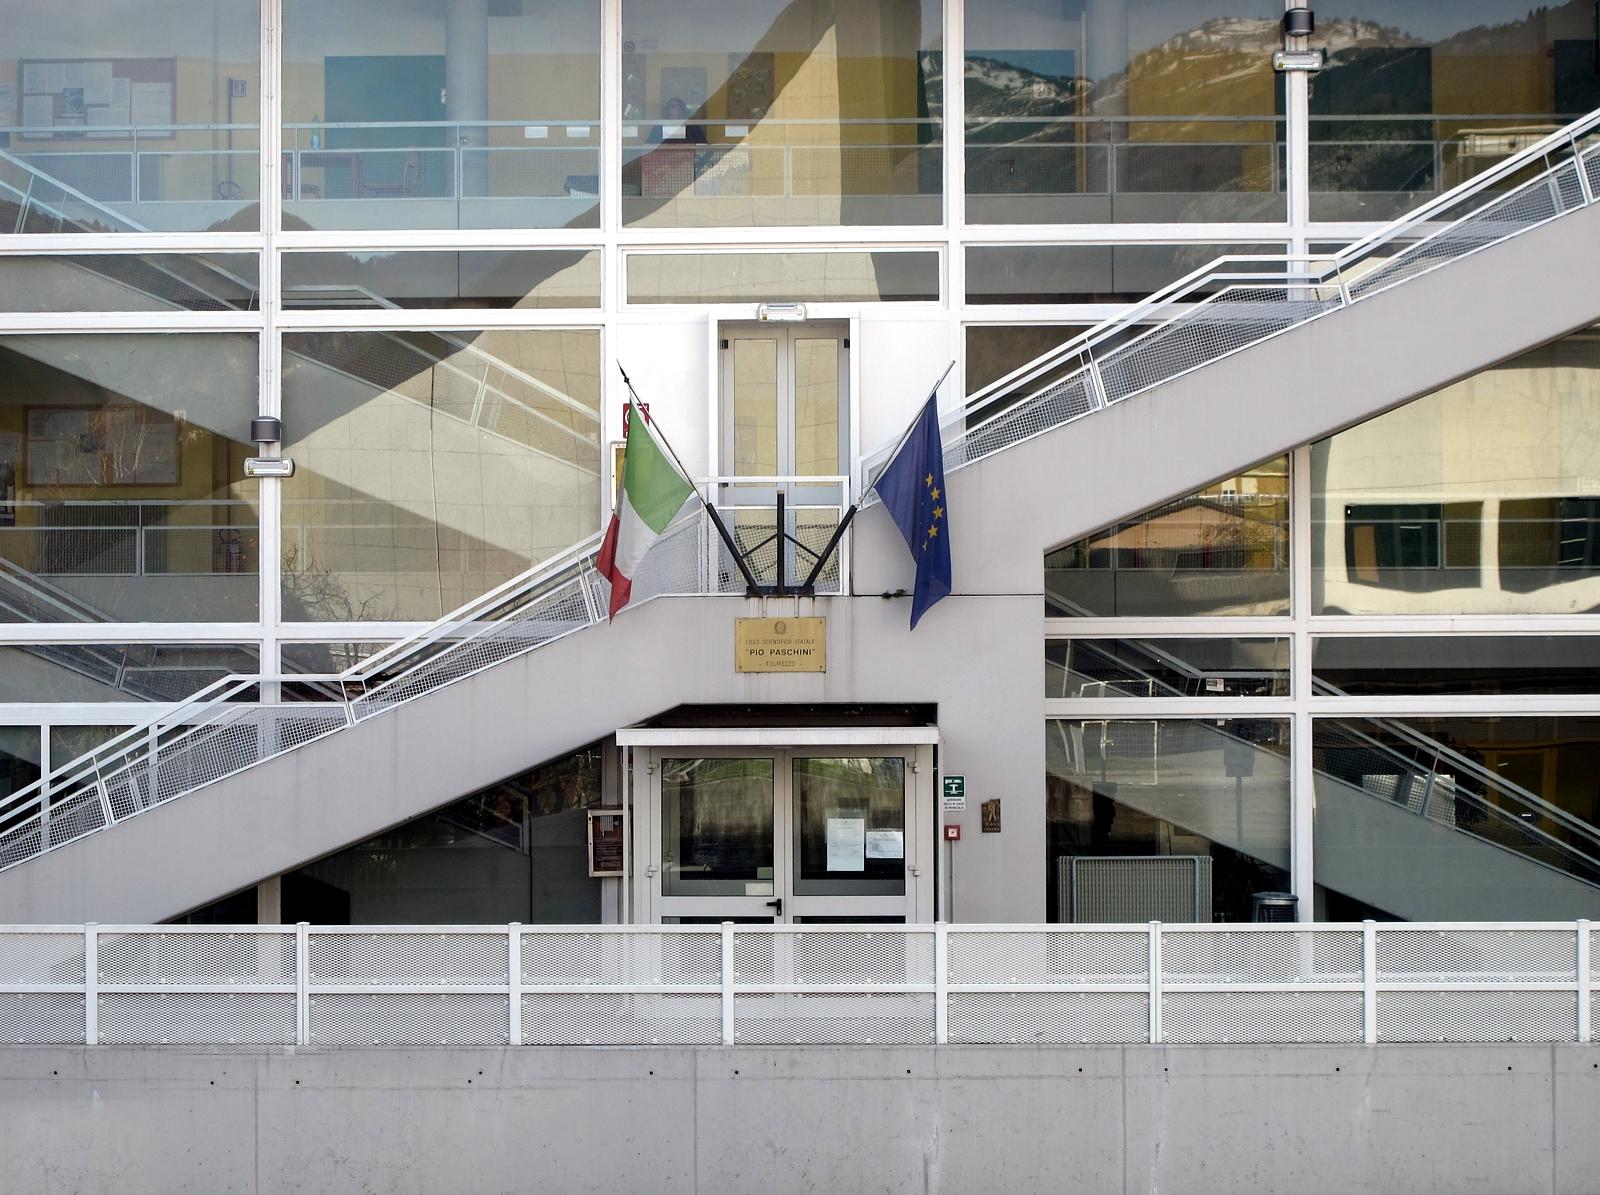 http://aldorossi.altervista.org/wp-content/uploads/2013/12/Liceo-Paschini-3_m.jpg